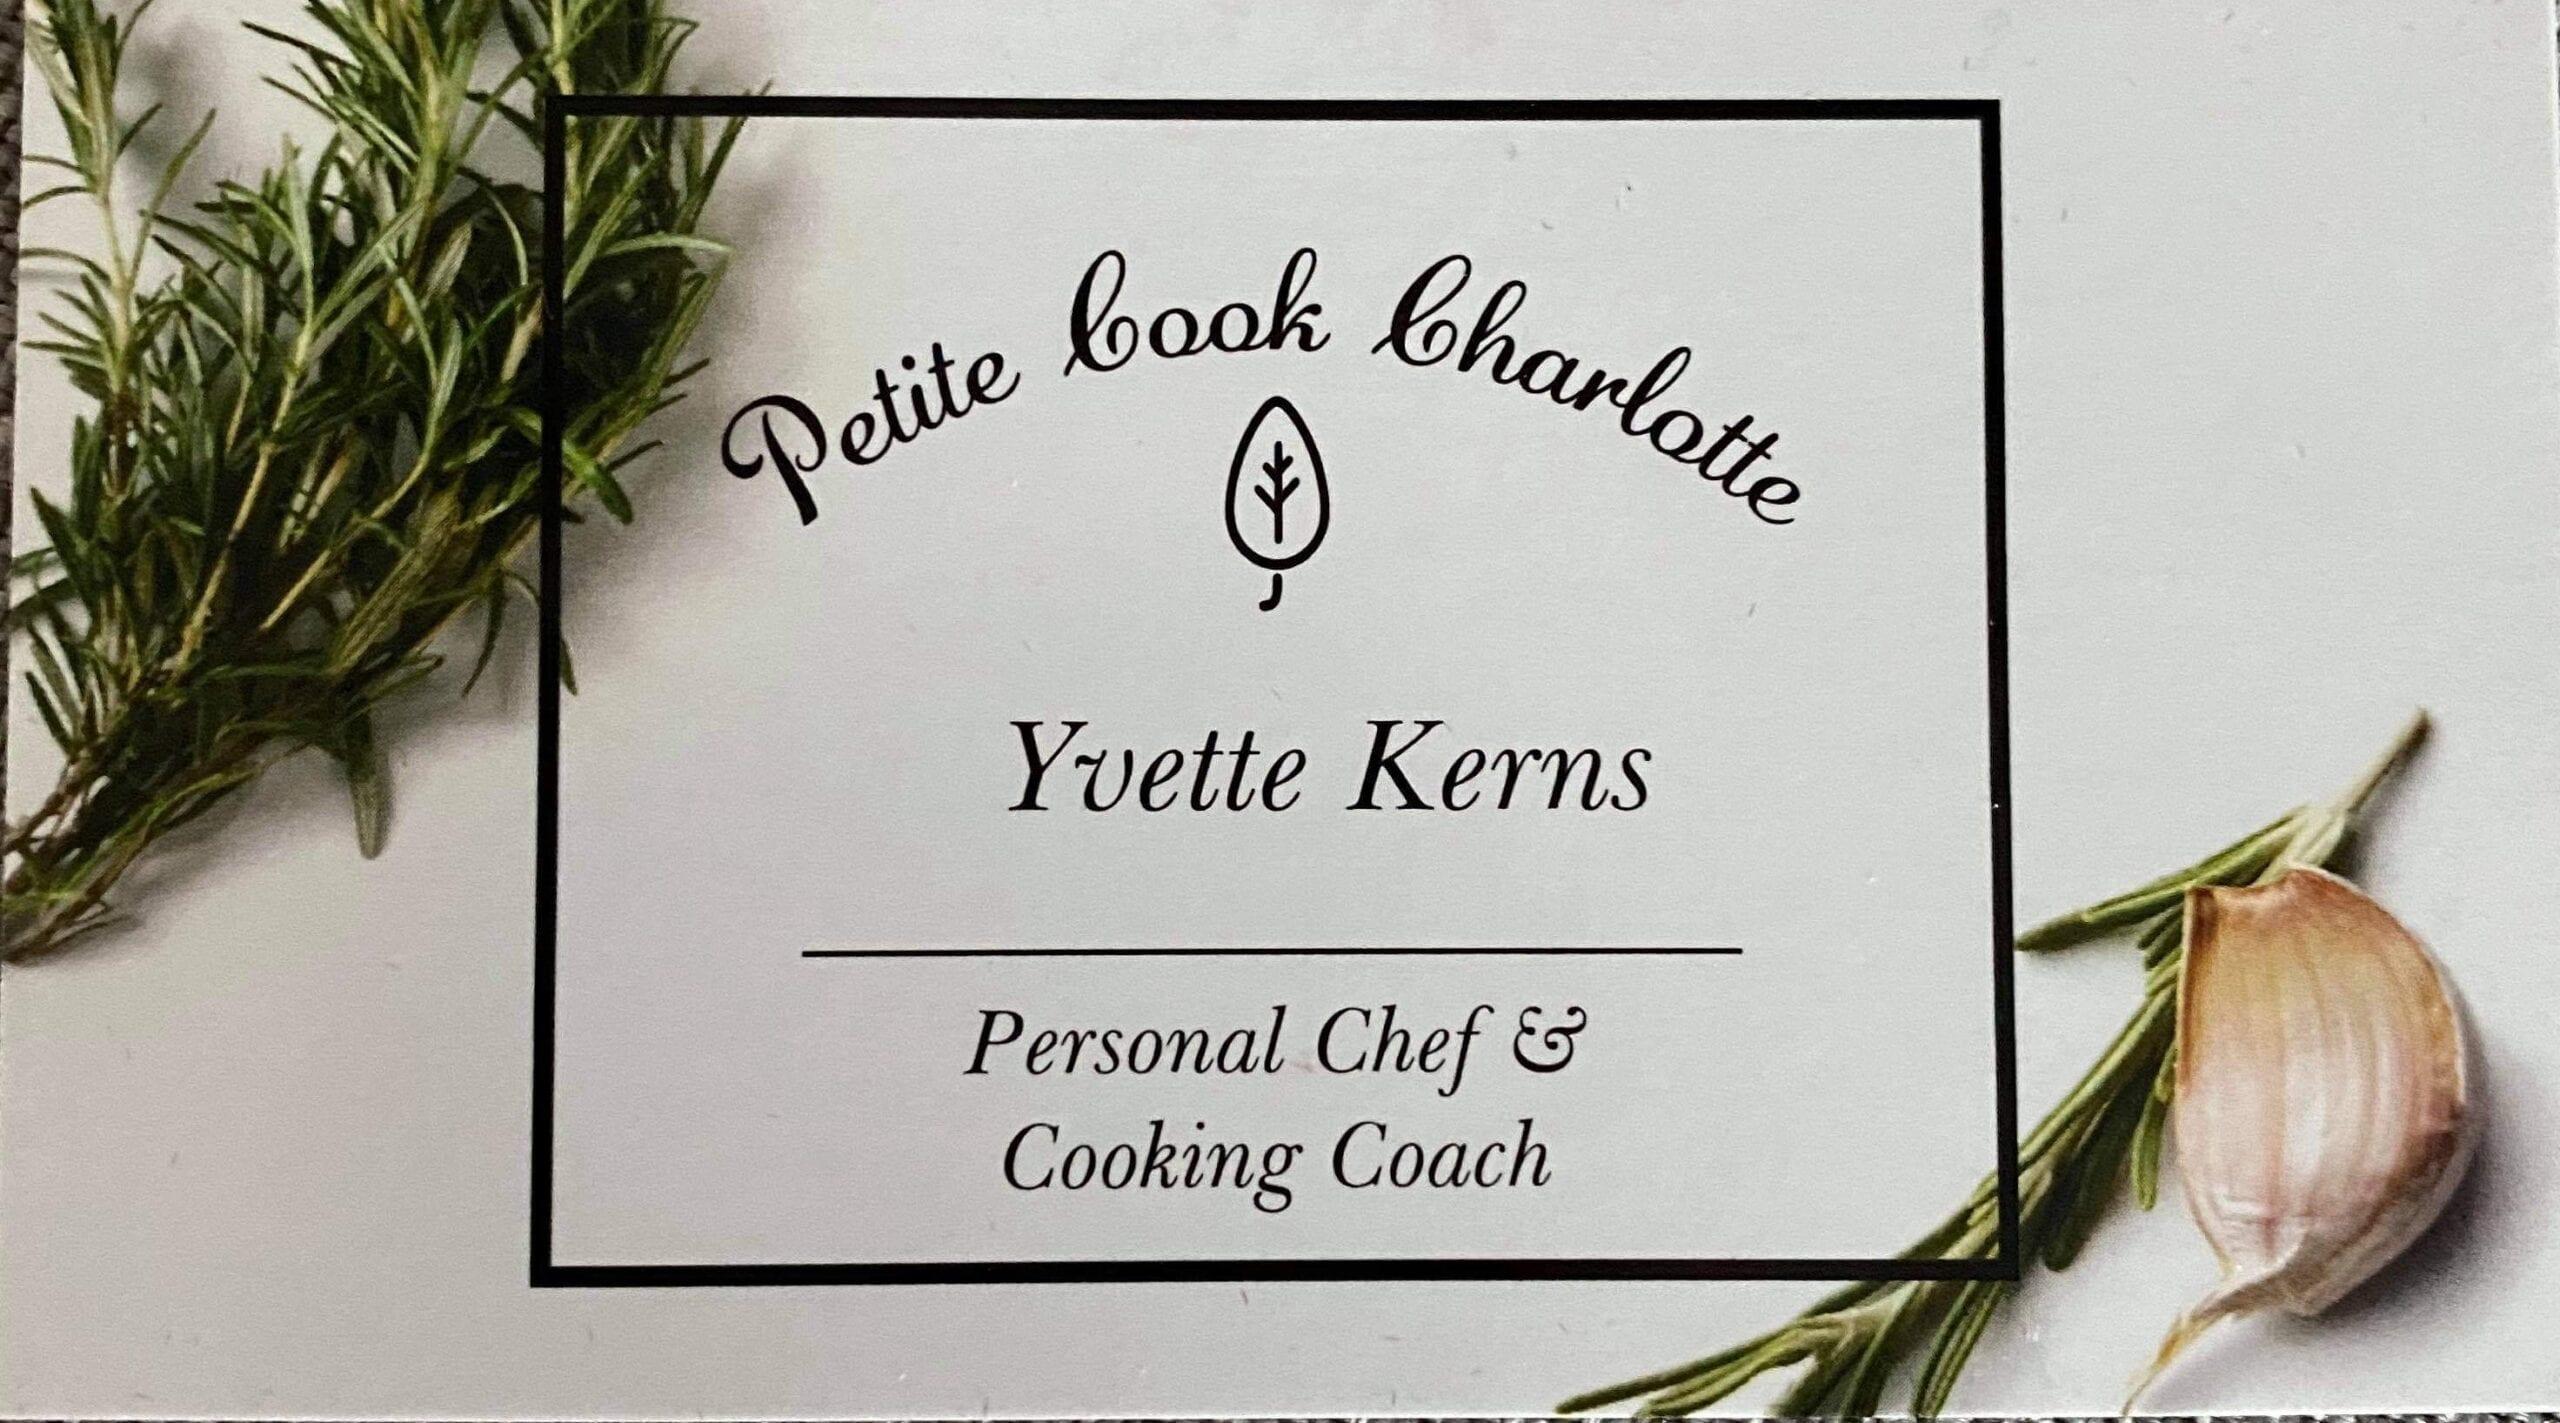 Petite Cook Charlotte